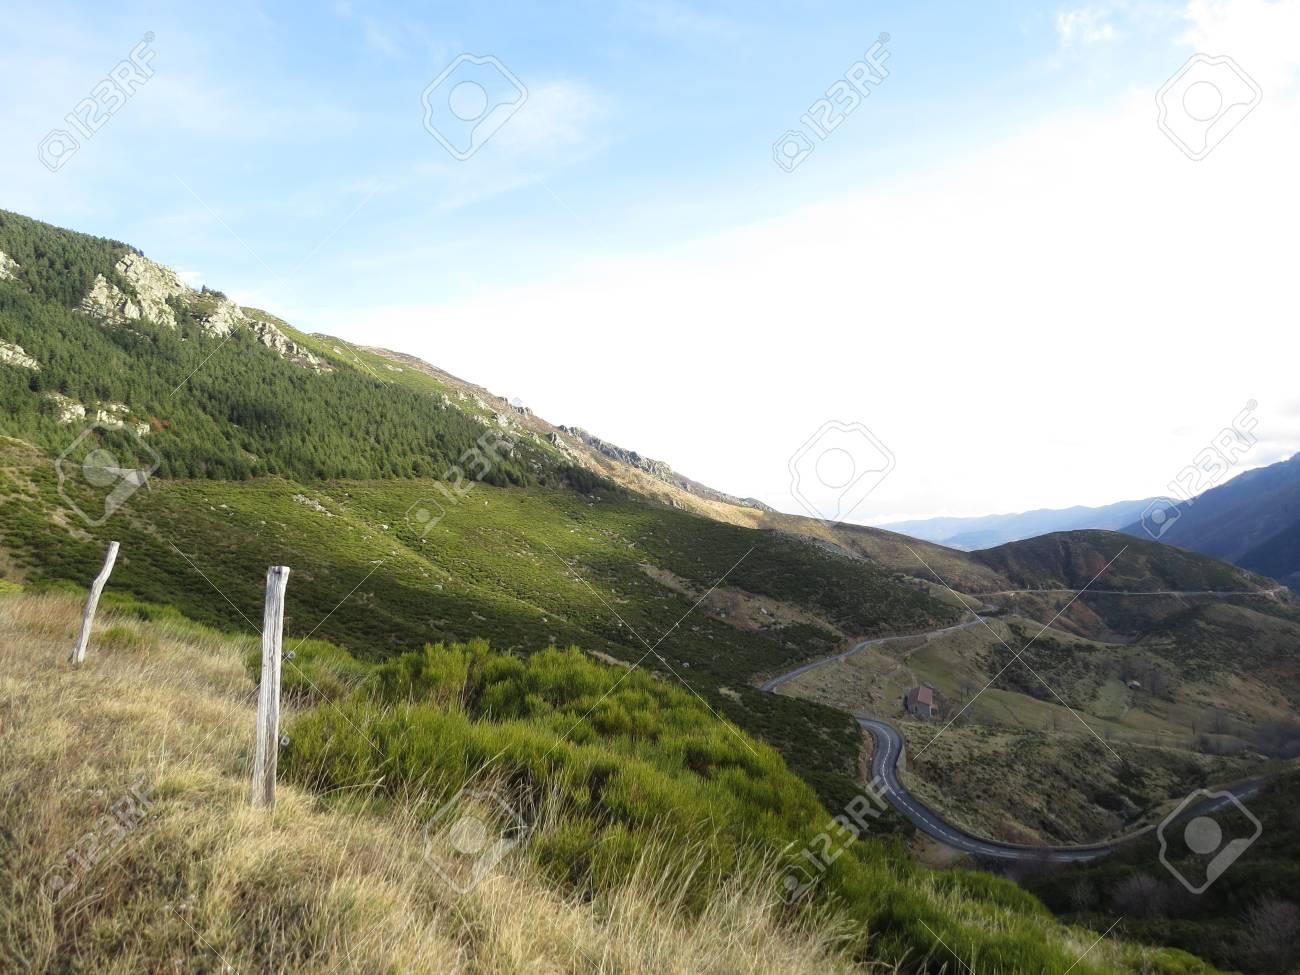 Panorama montagne ardechoise - 43390620